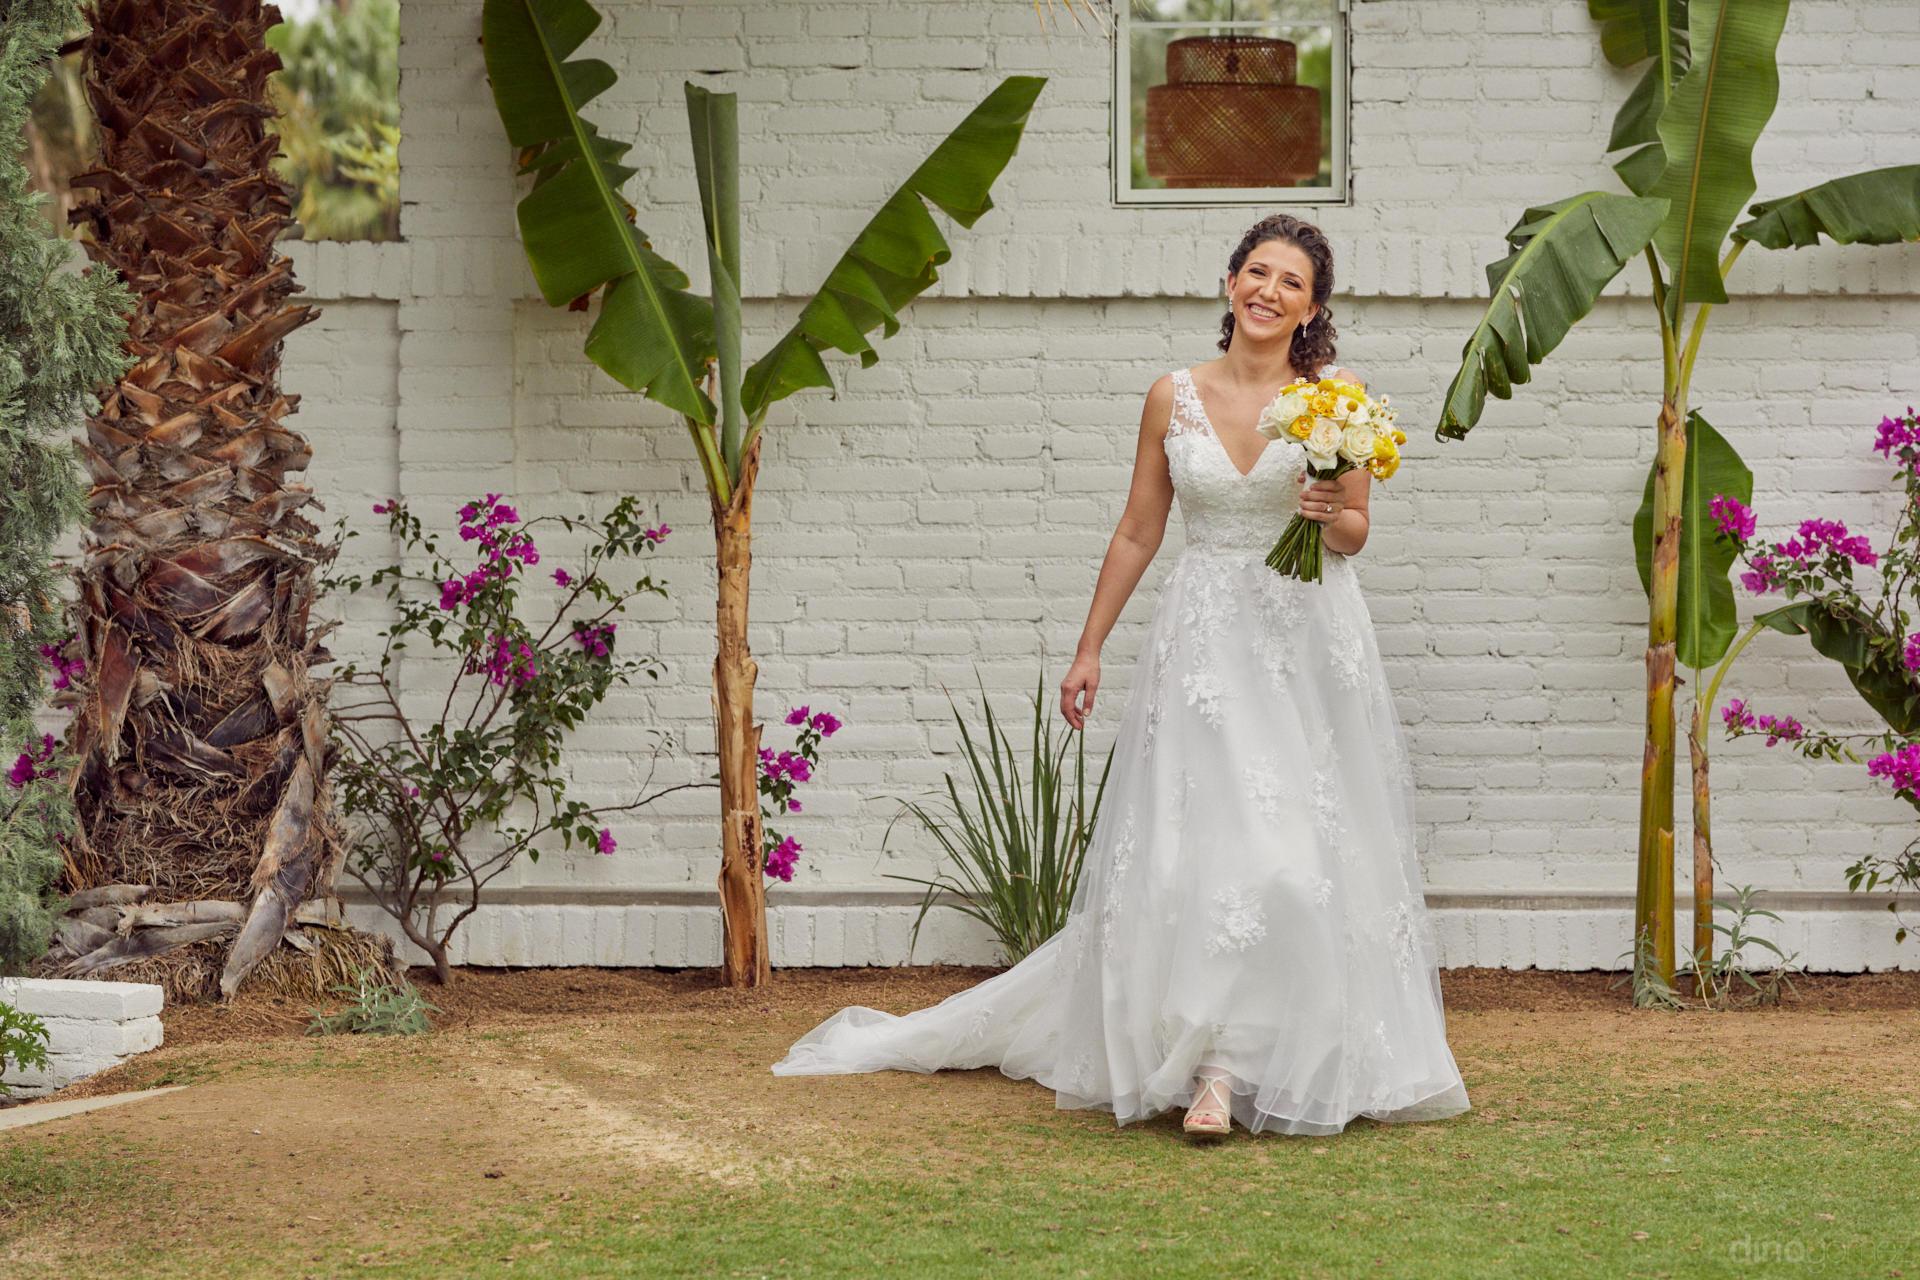 Fun Cabo Wedding Photographers For Weddings - Hilary & Bryan Flora Wedding